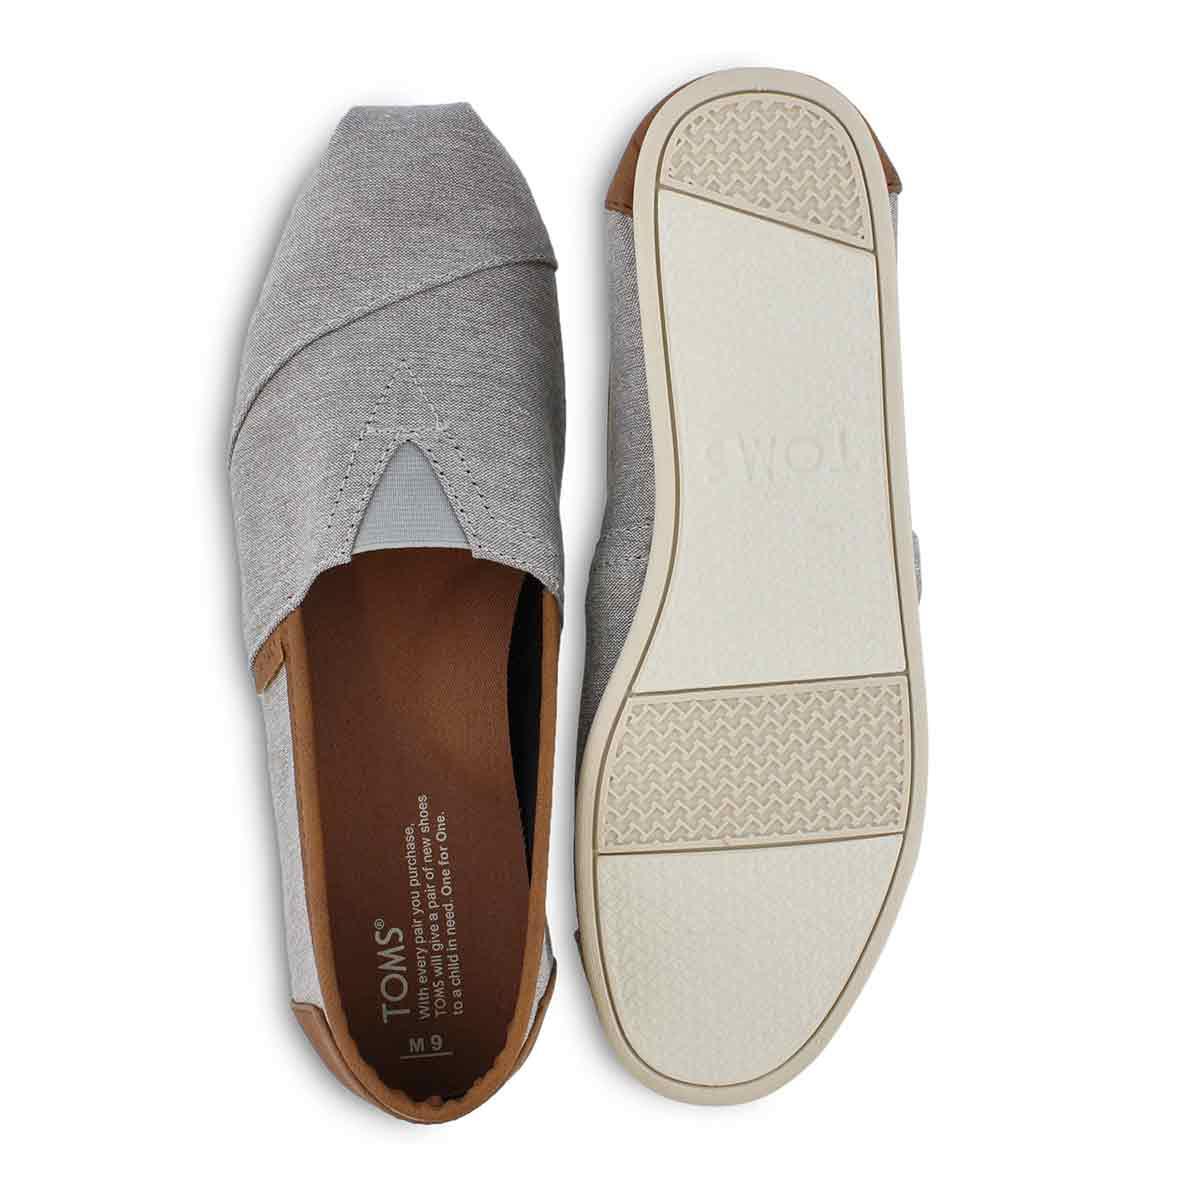 Mns Classic Lthr Trim grey casual loafer